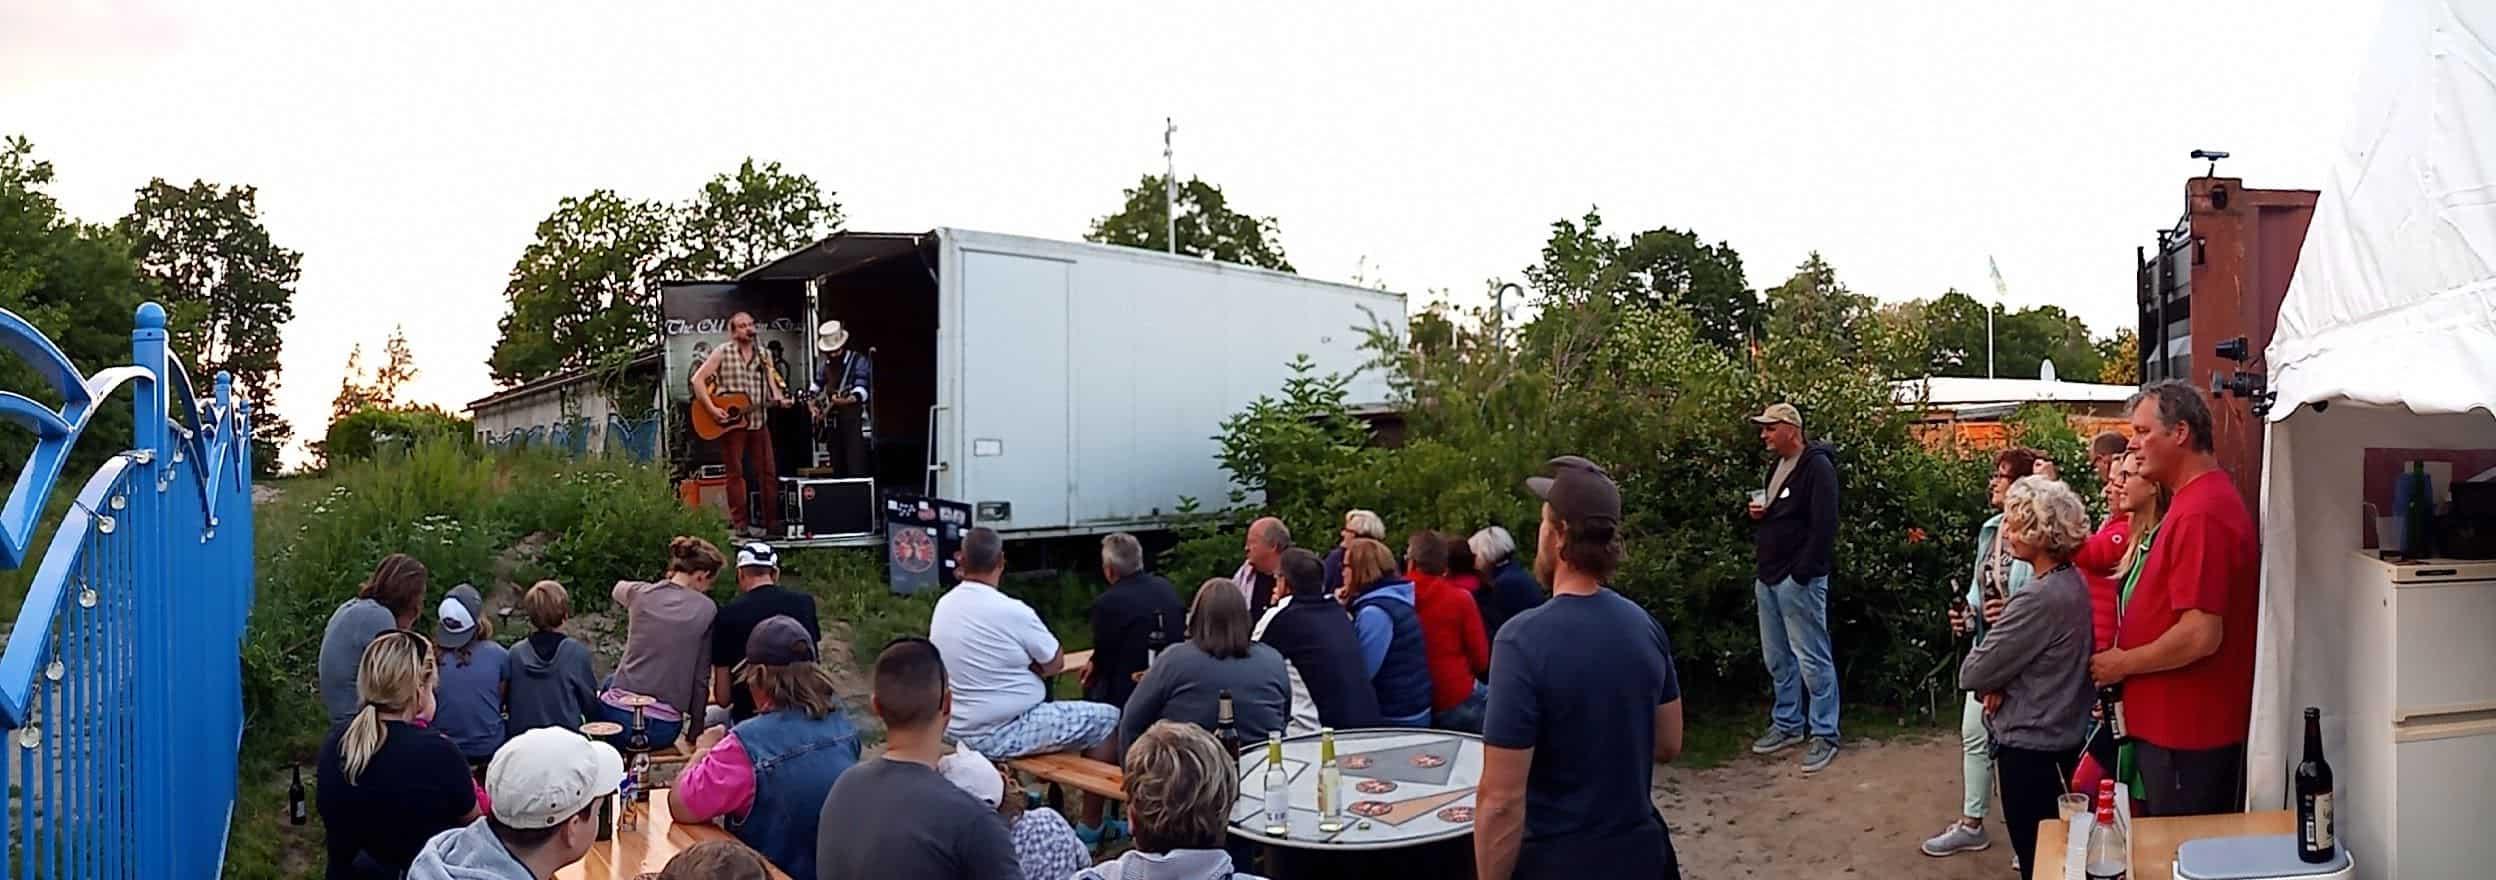 midsommer-2019-kitesafede